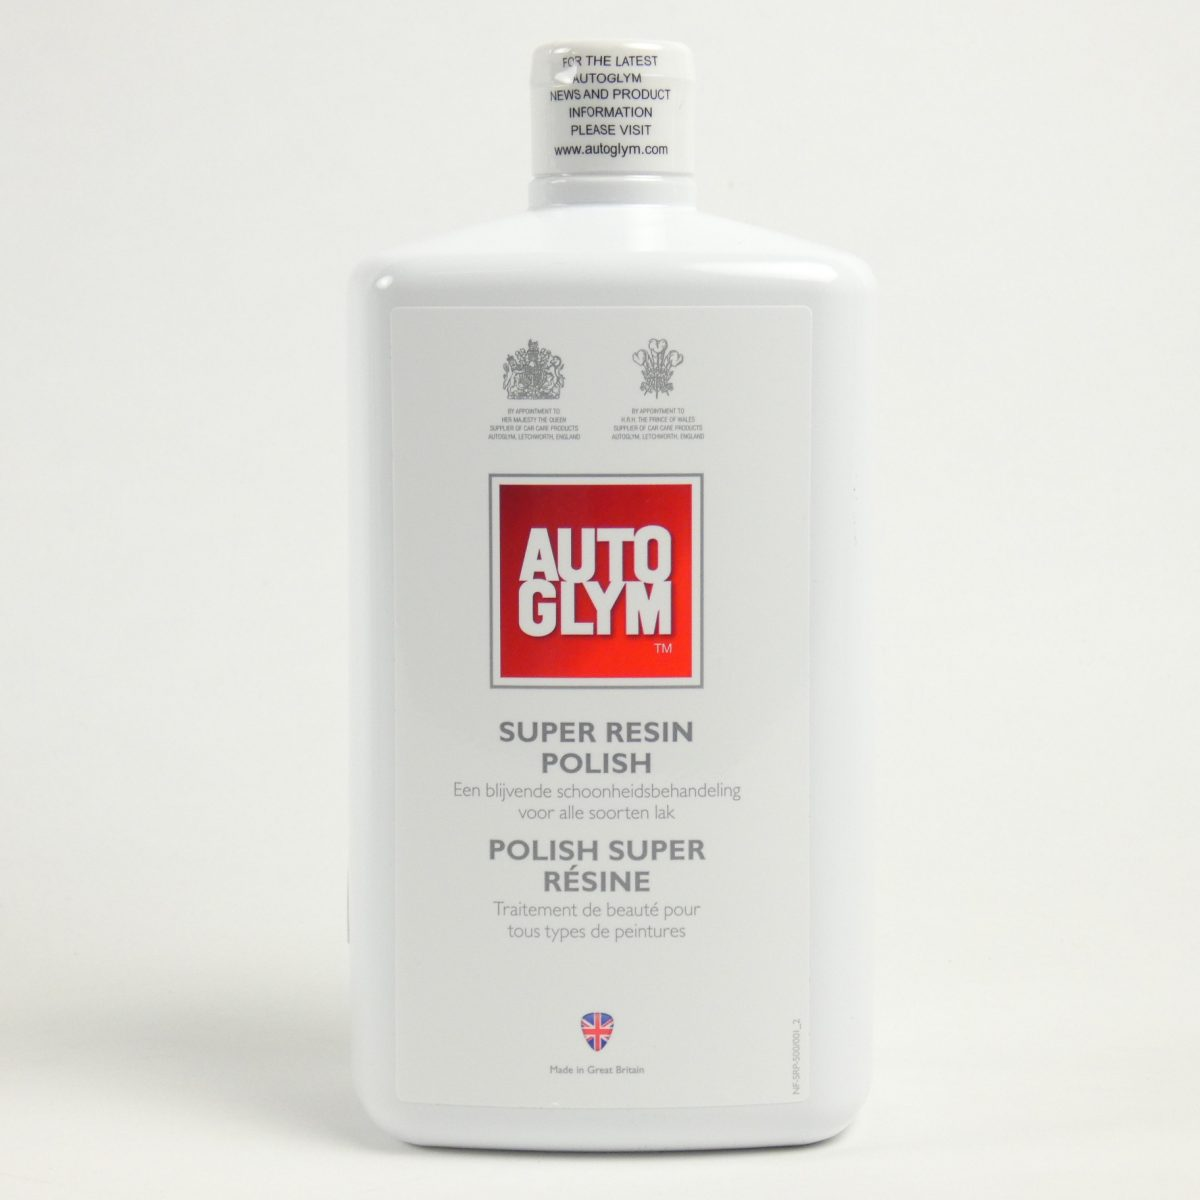 Autoglym Super resin polish 1L